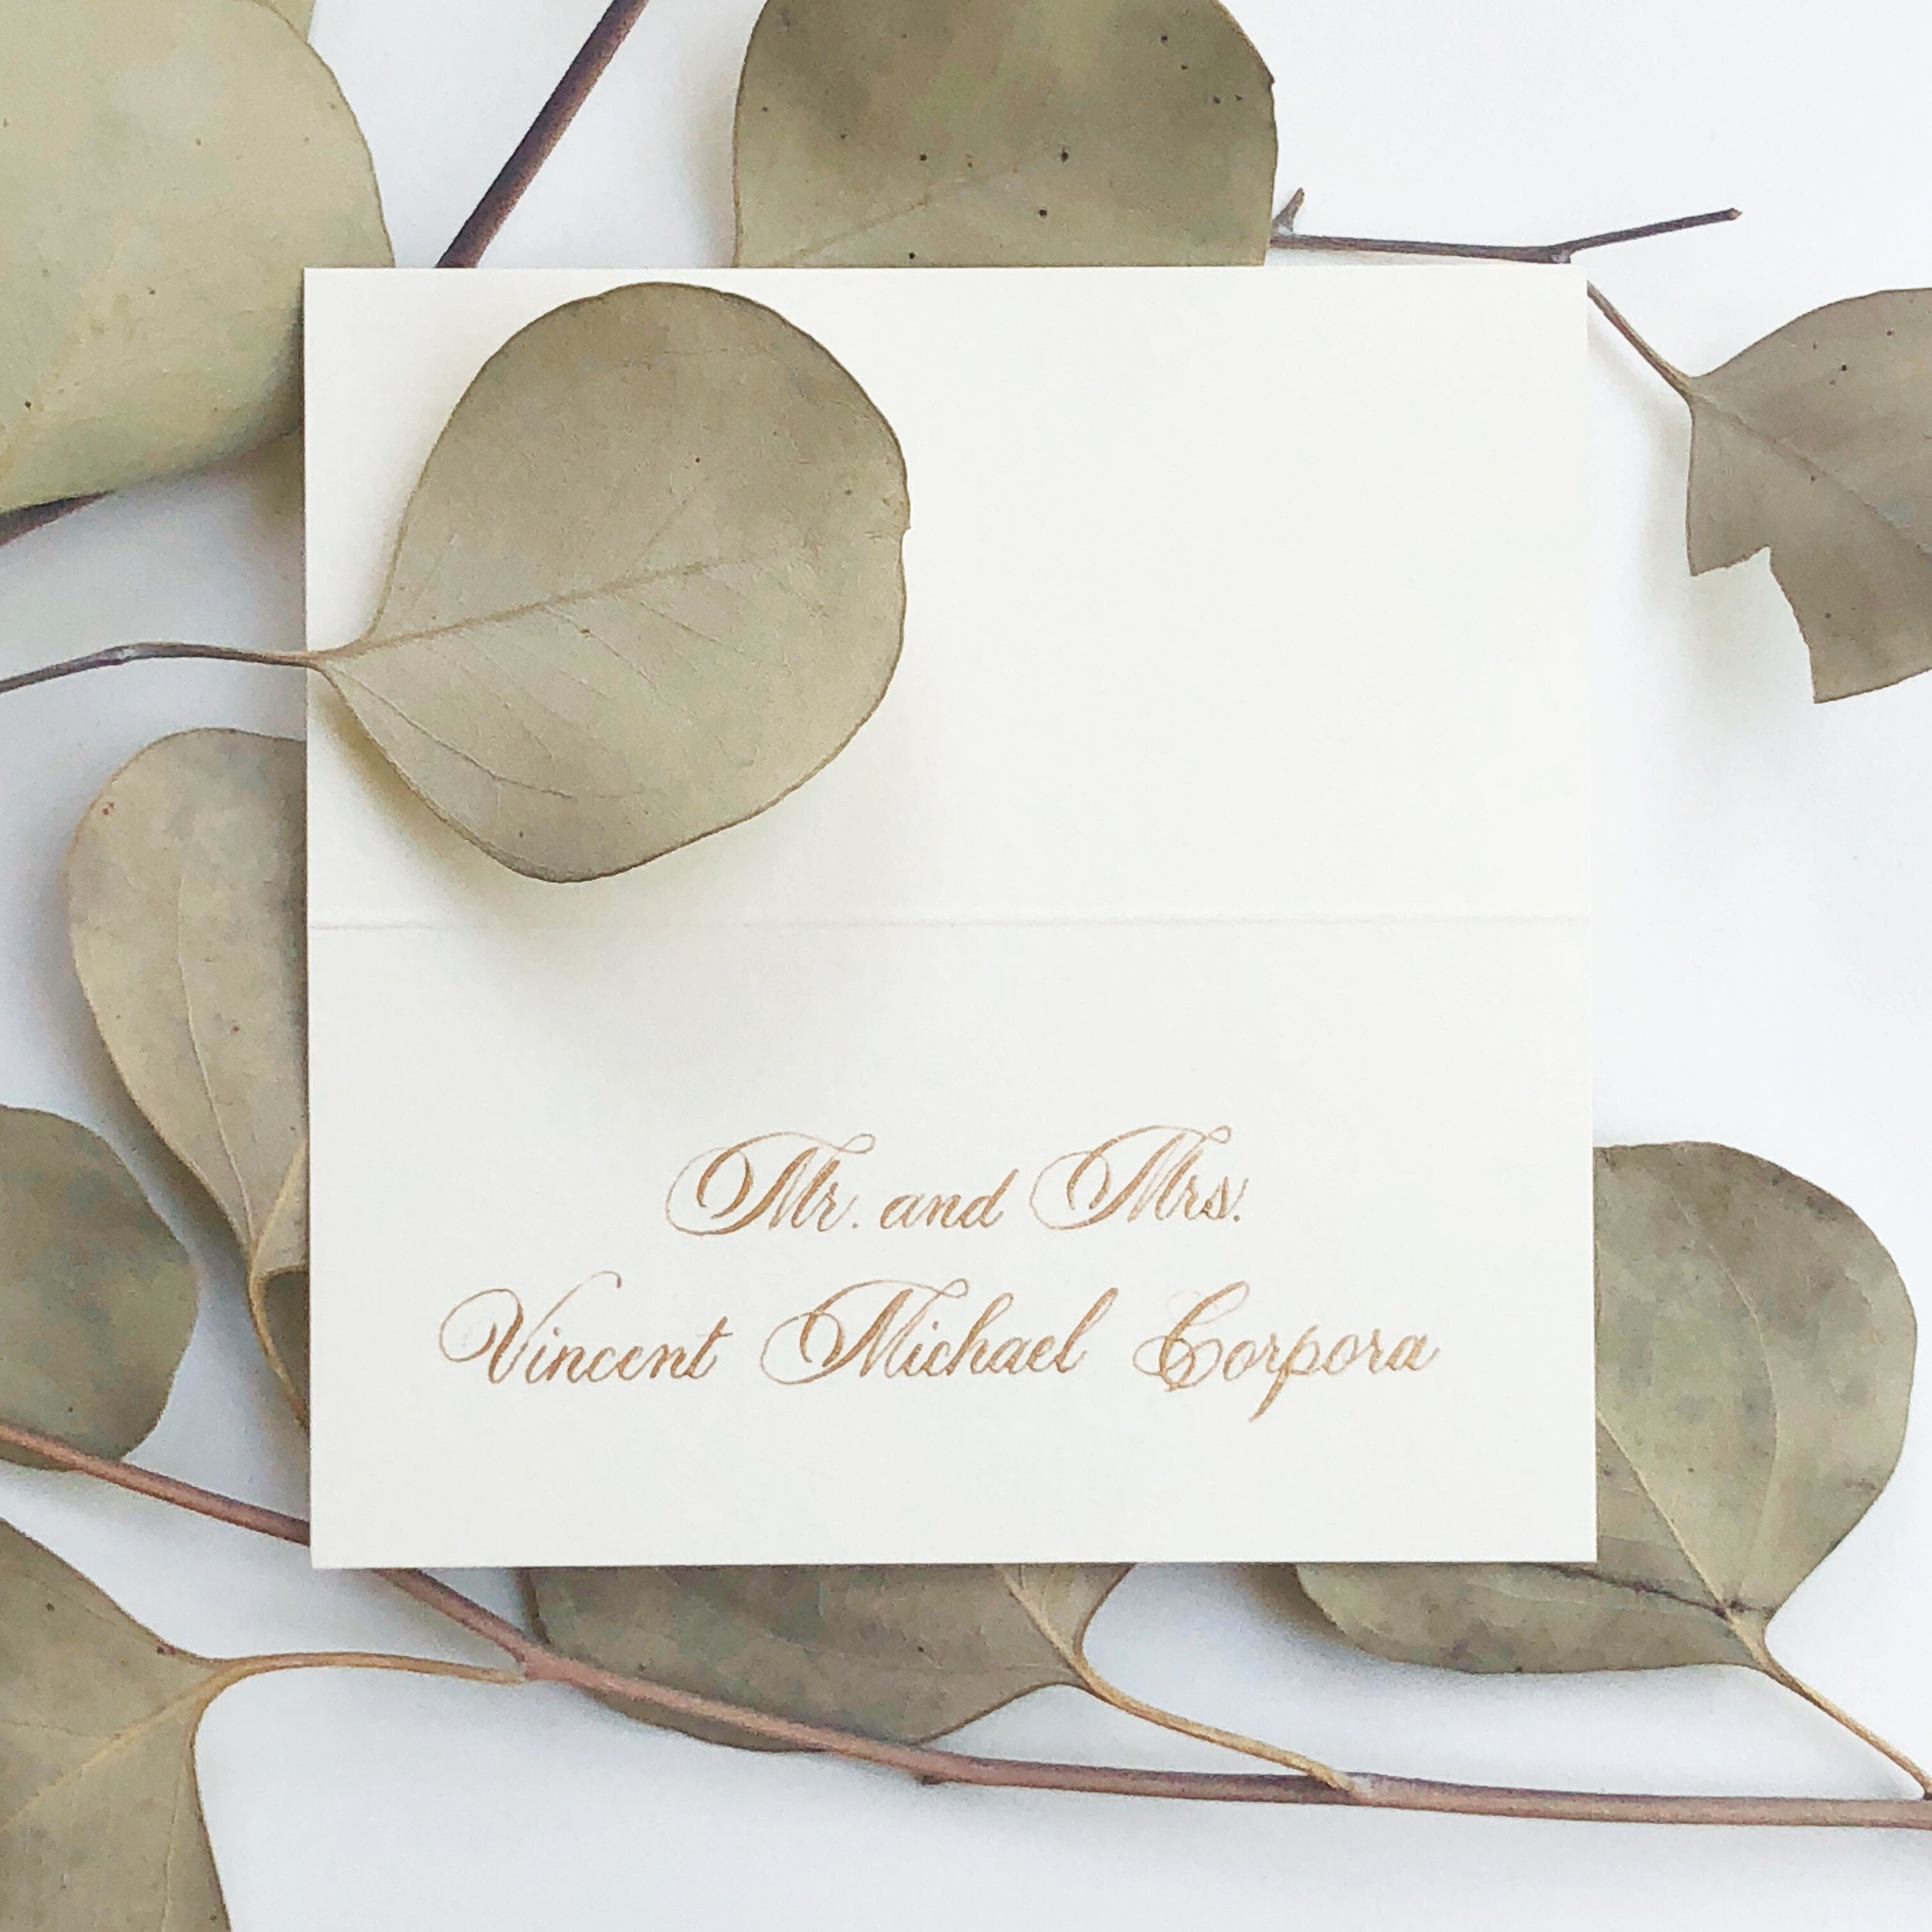 Central PA, York PA, JesSmith Designs, custom, wedding, invitations, bridal, Harrisburg, hanover, calligraphy, baltimore, wedding invitations, lancaster, gettysburg, 08-26 06.19.24.jpg